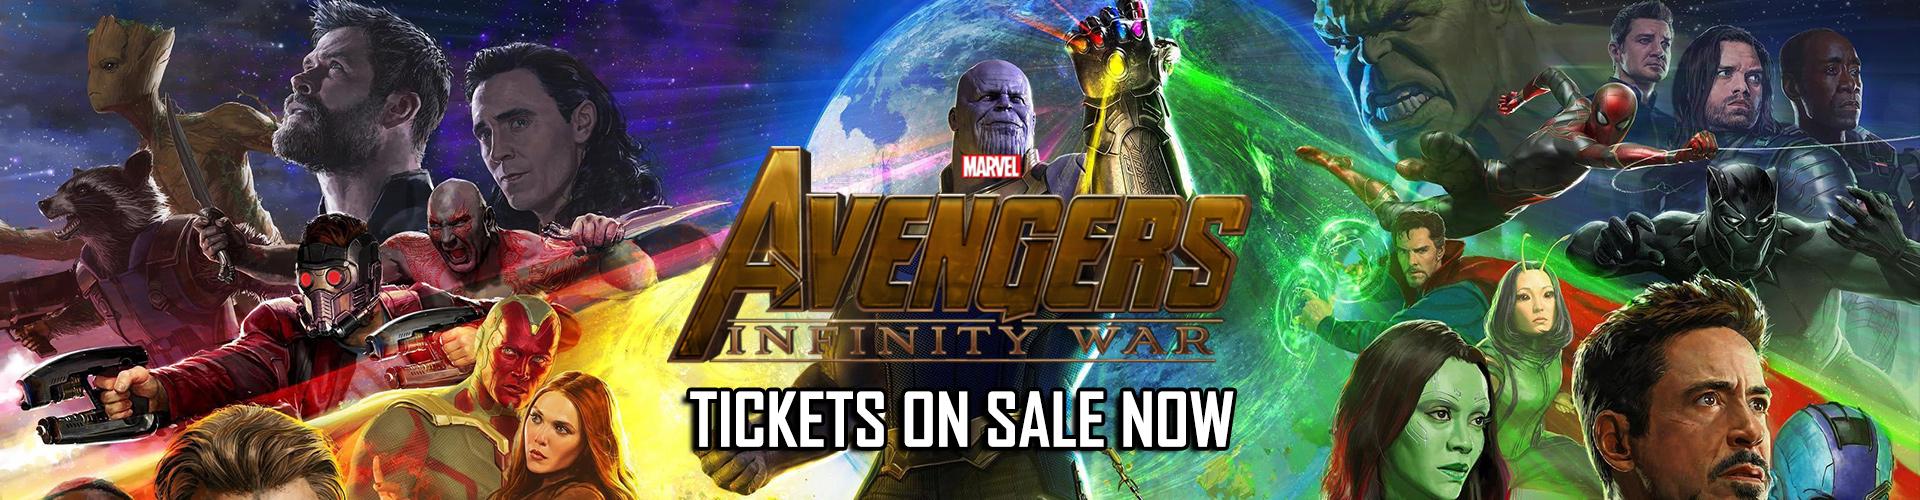 avengers-tickets-on-sale